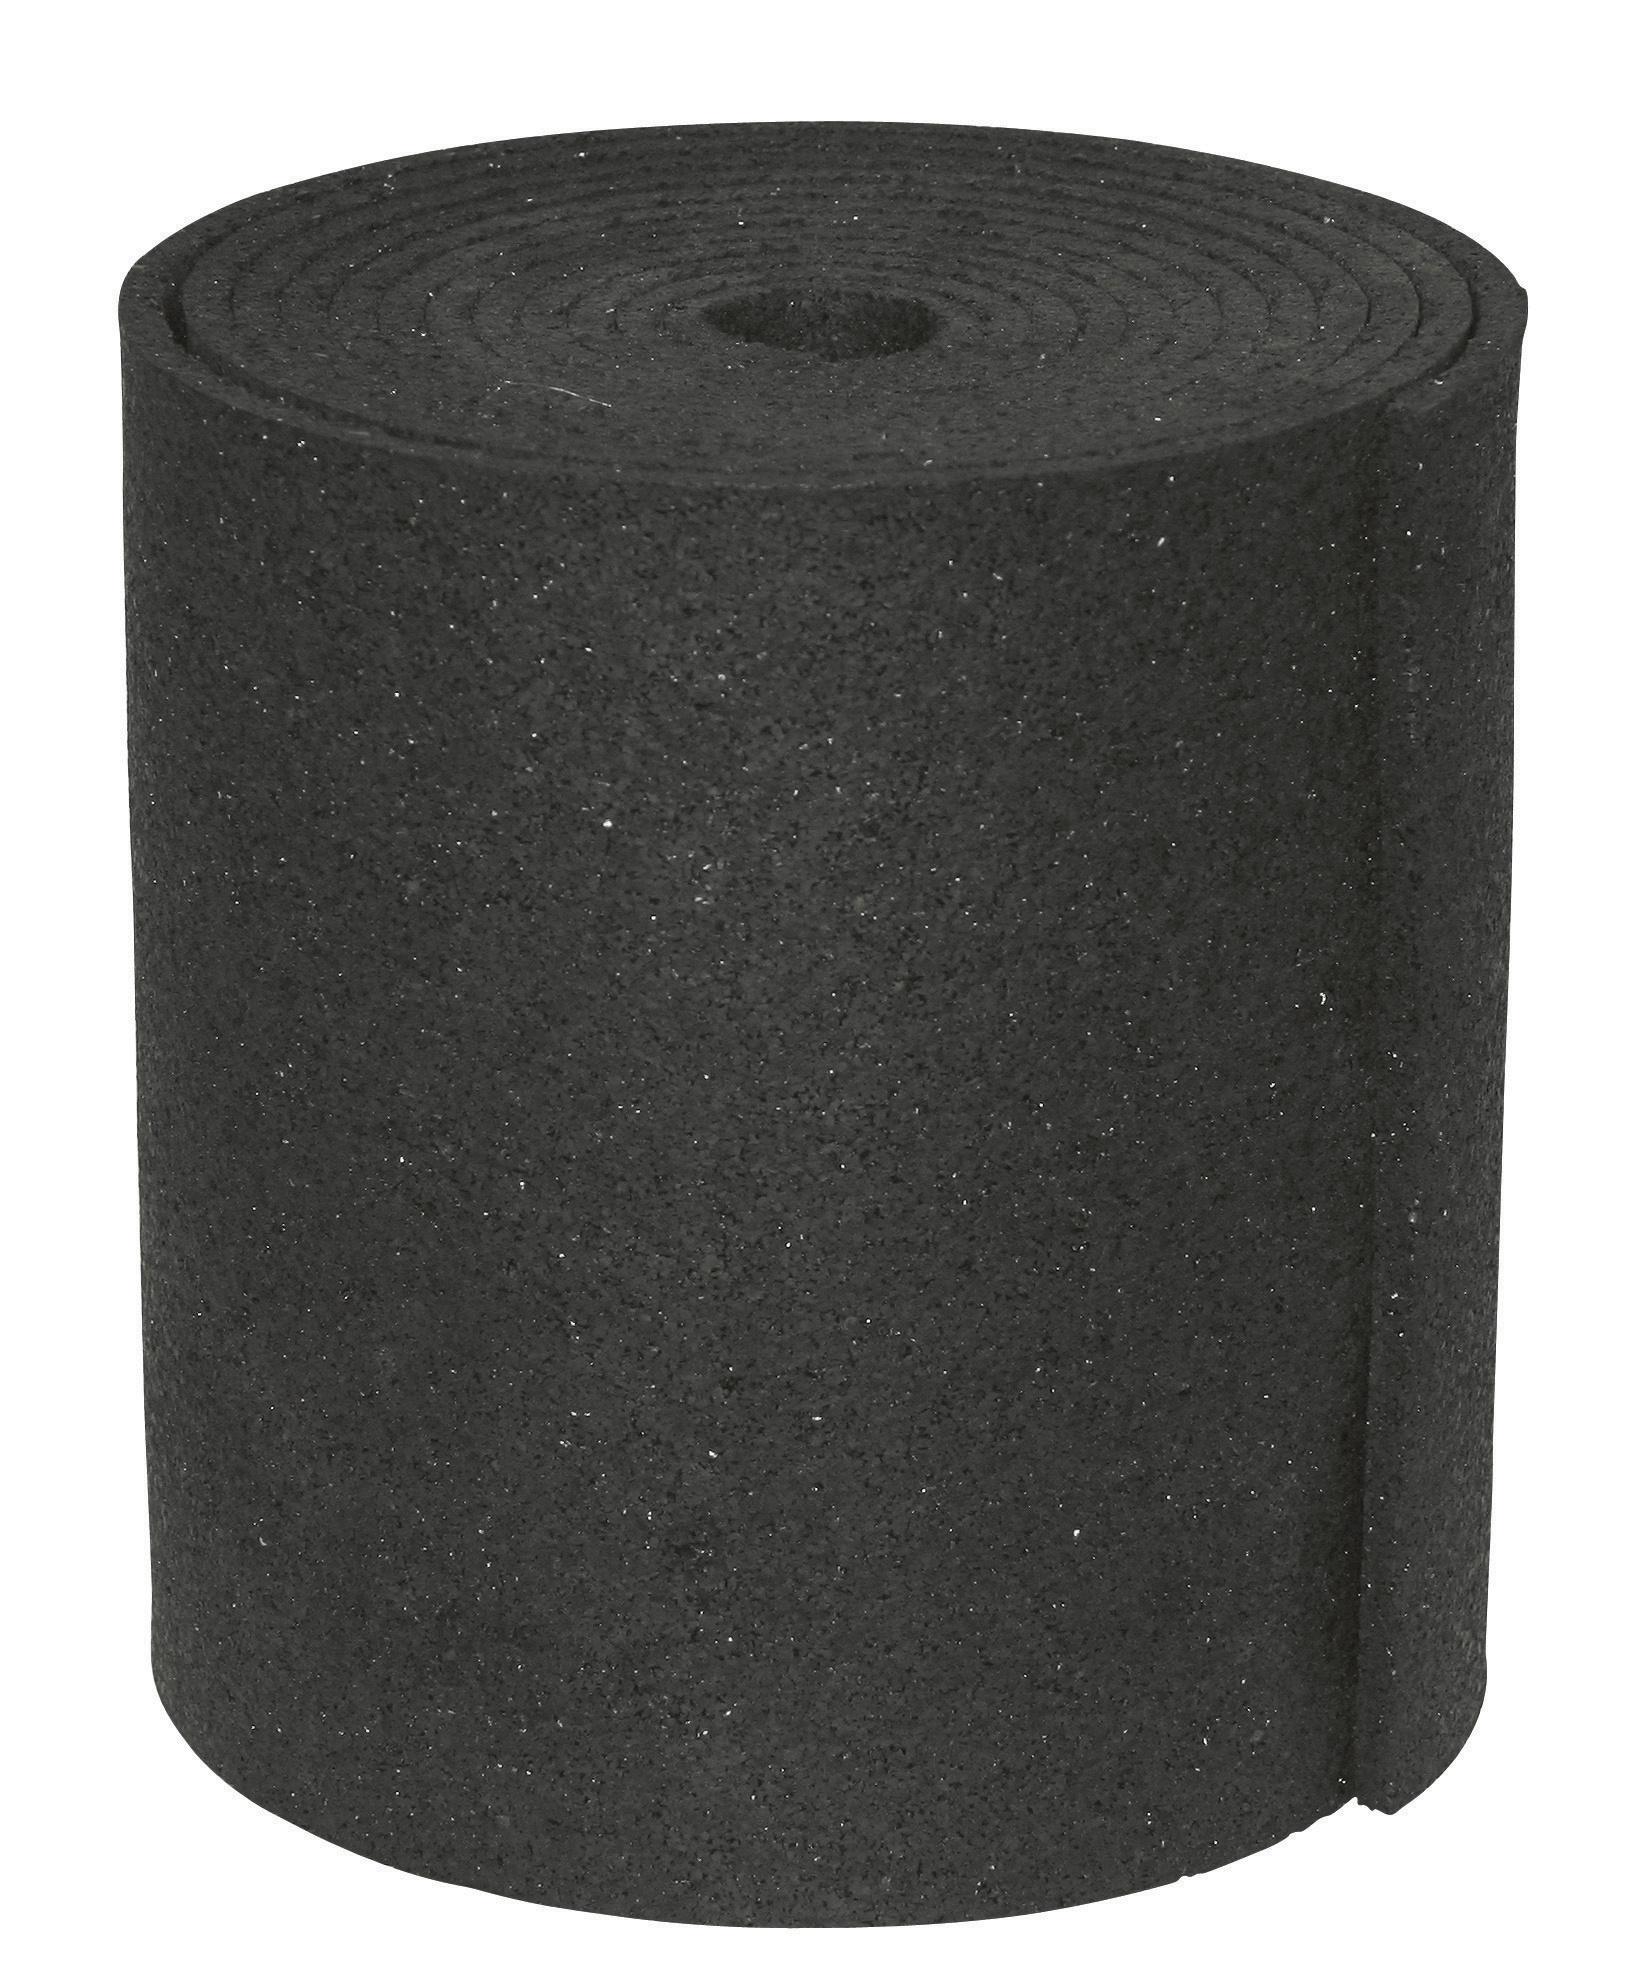 Anti-Rutsch-Matte 25 cm x 0,8 cm, 5 m-Rolle